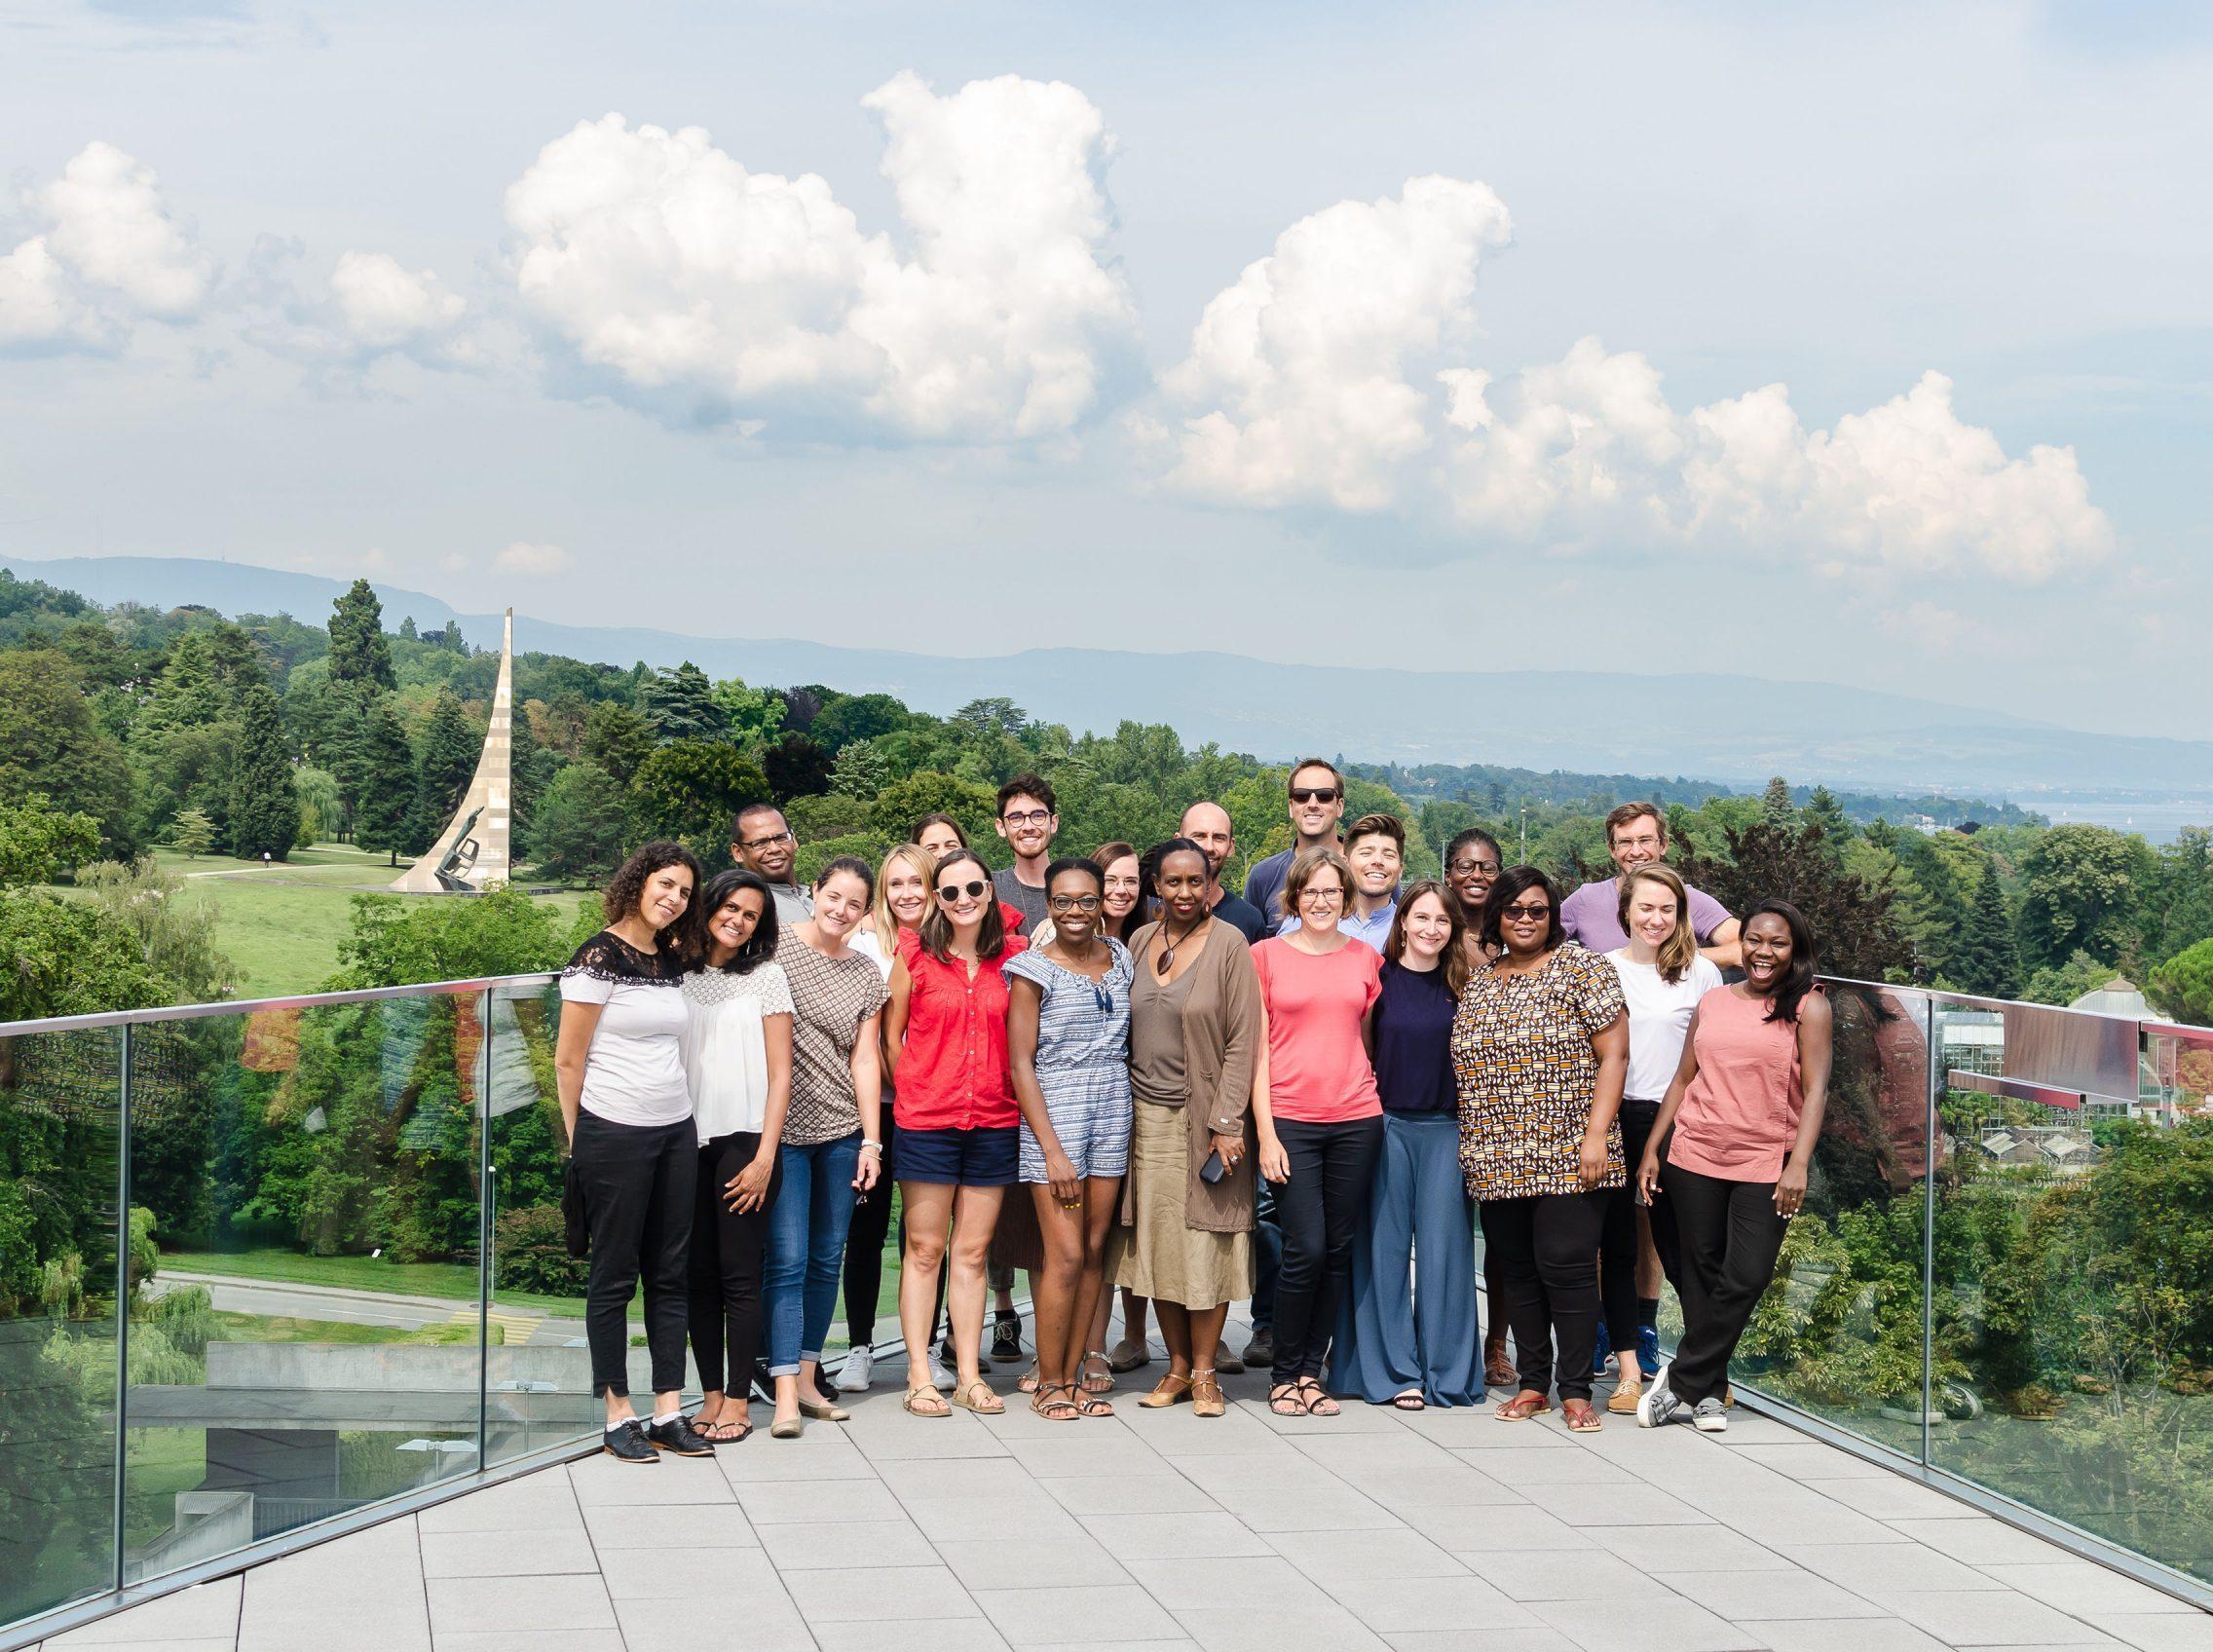 ISHR's staff strategy retreat group photo